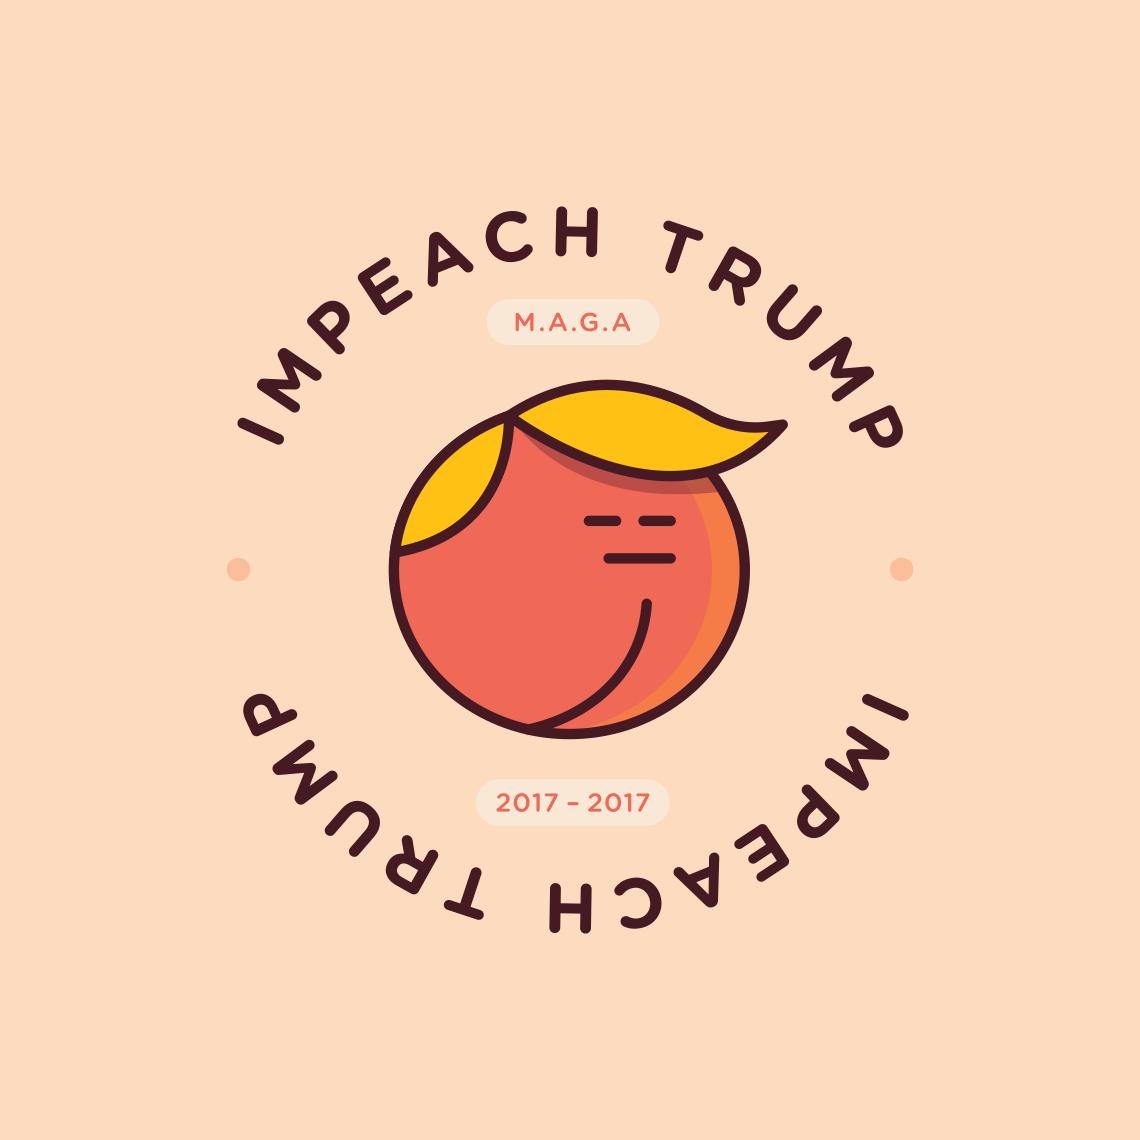 p_PoliticalSocial_ImpeachTrump_OP